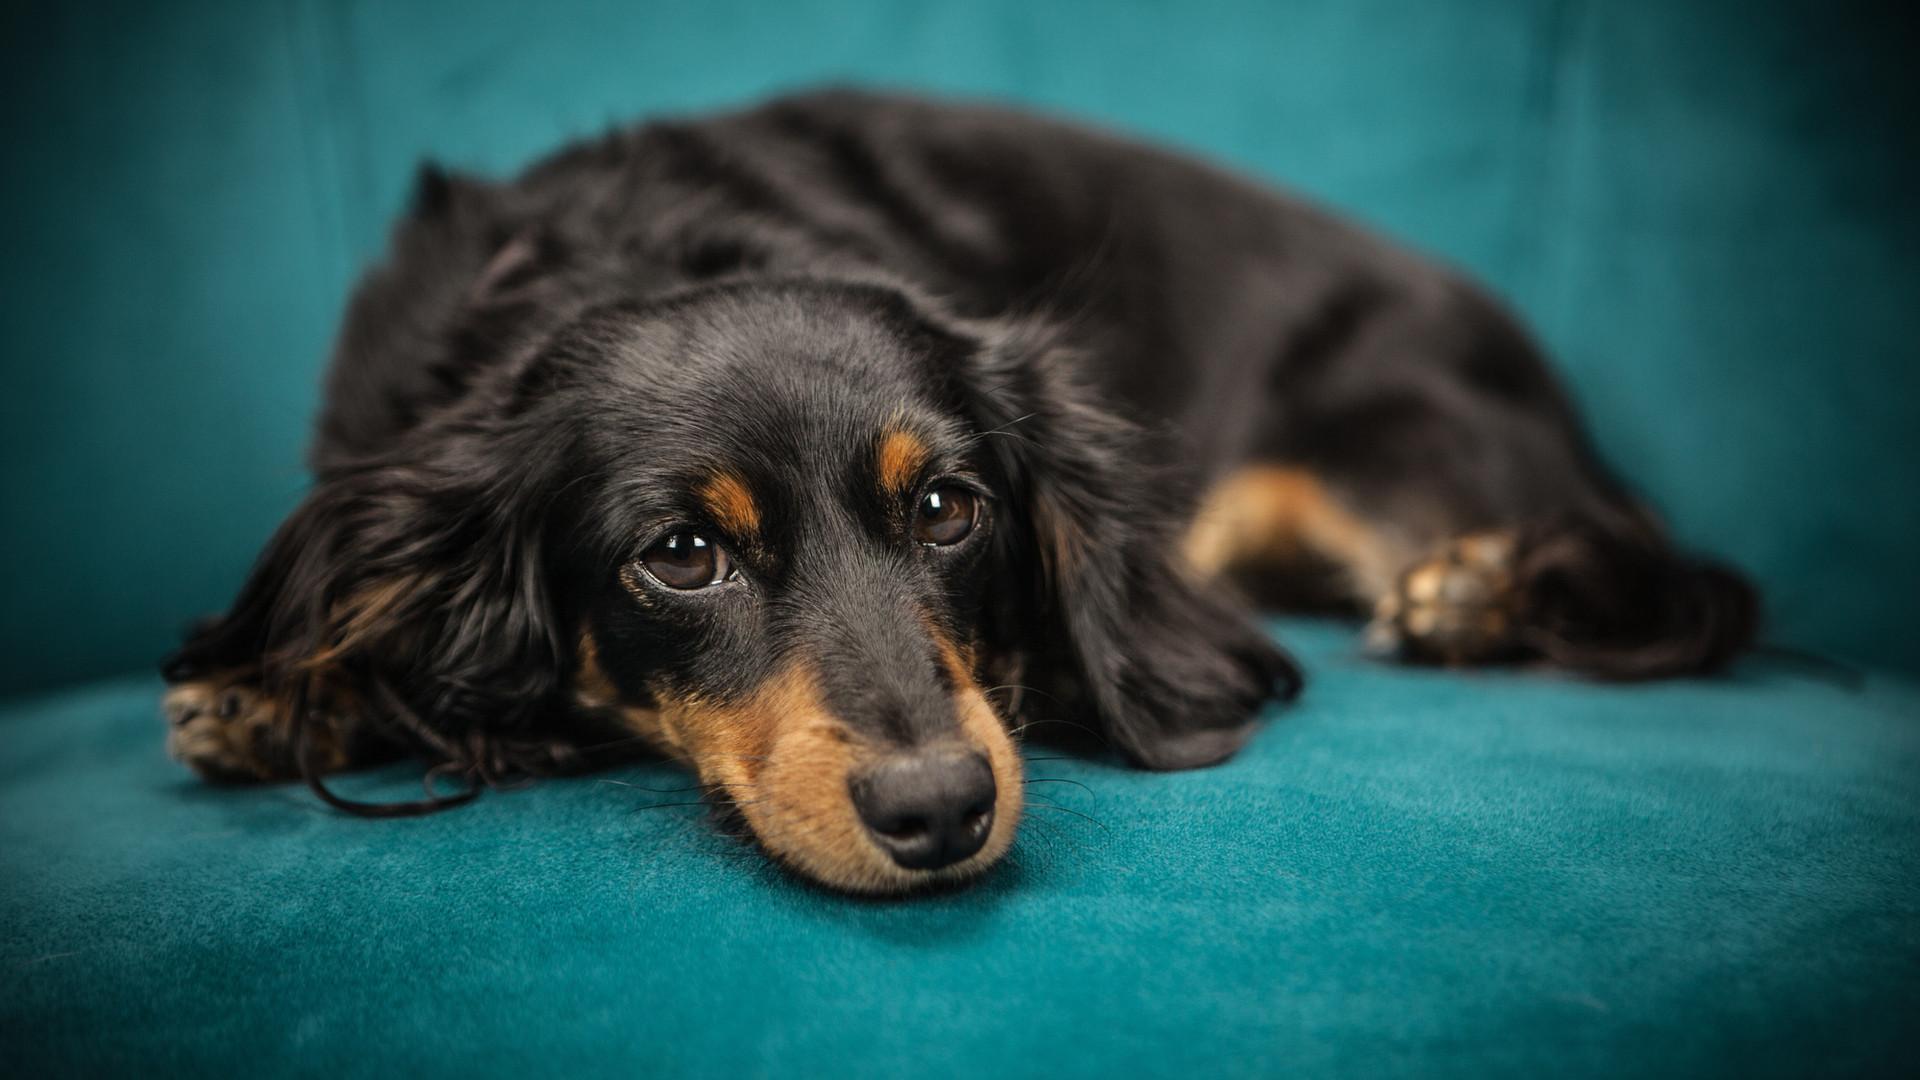 black-and-tan-long-coat-dog-169524.jpg